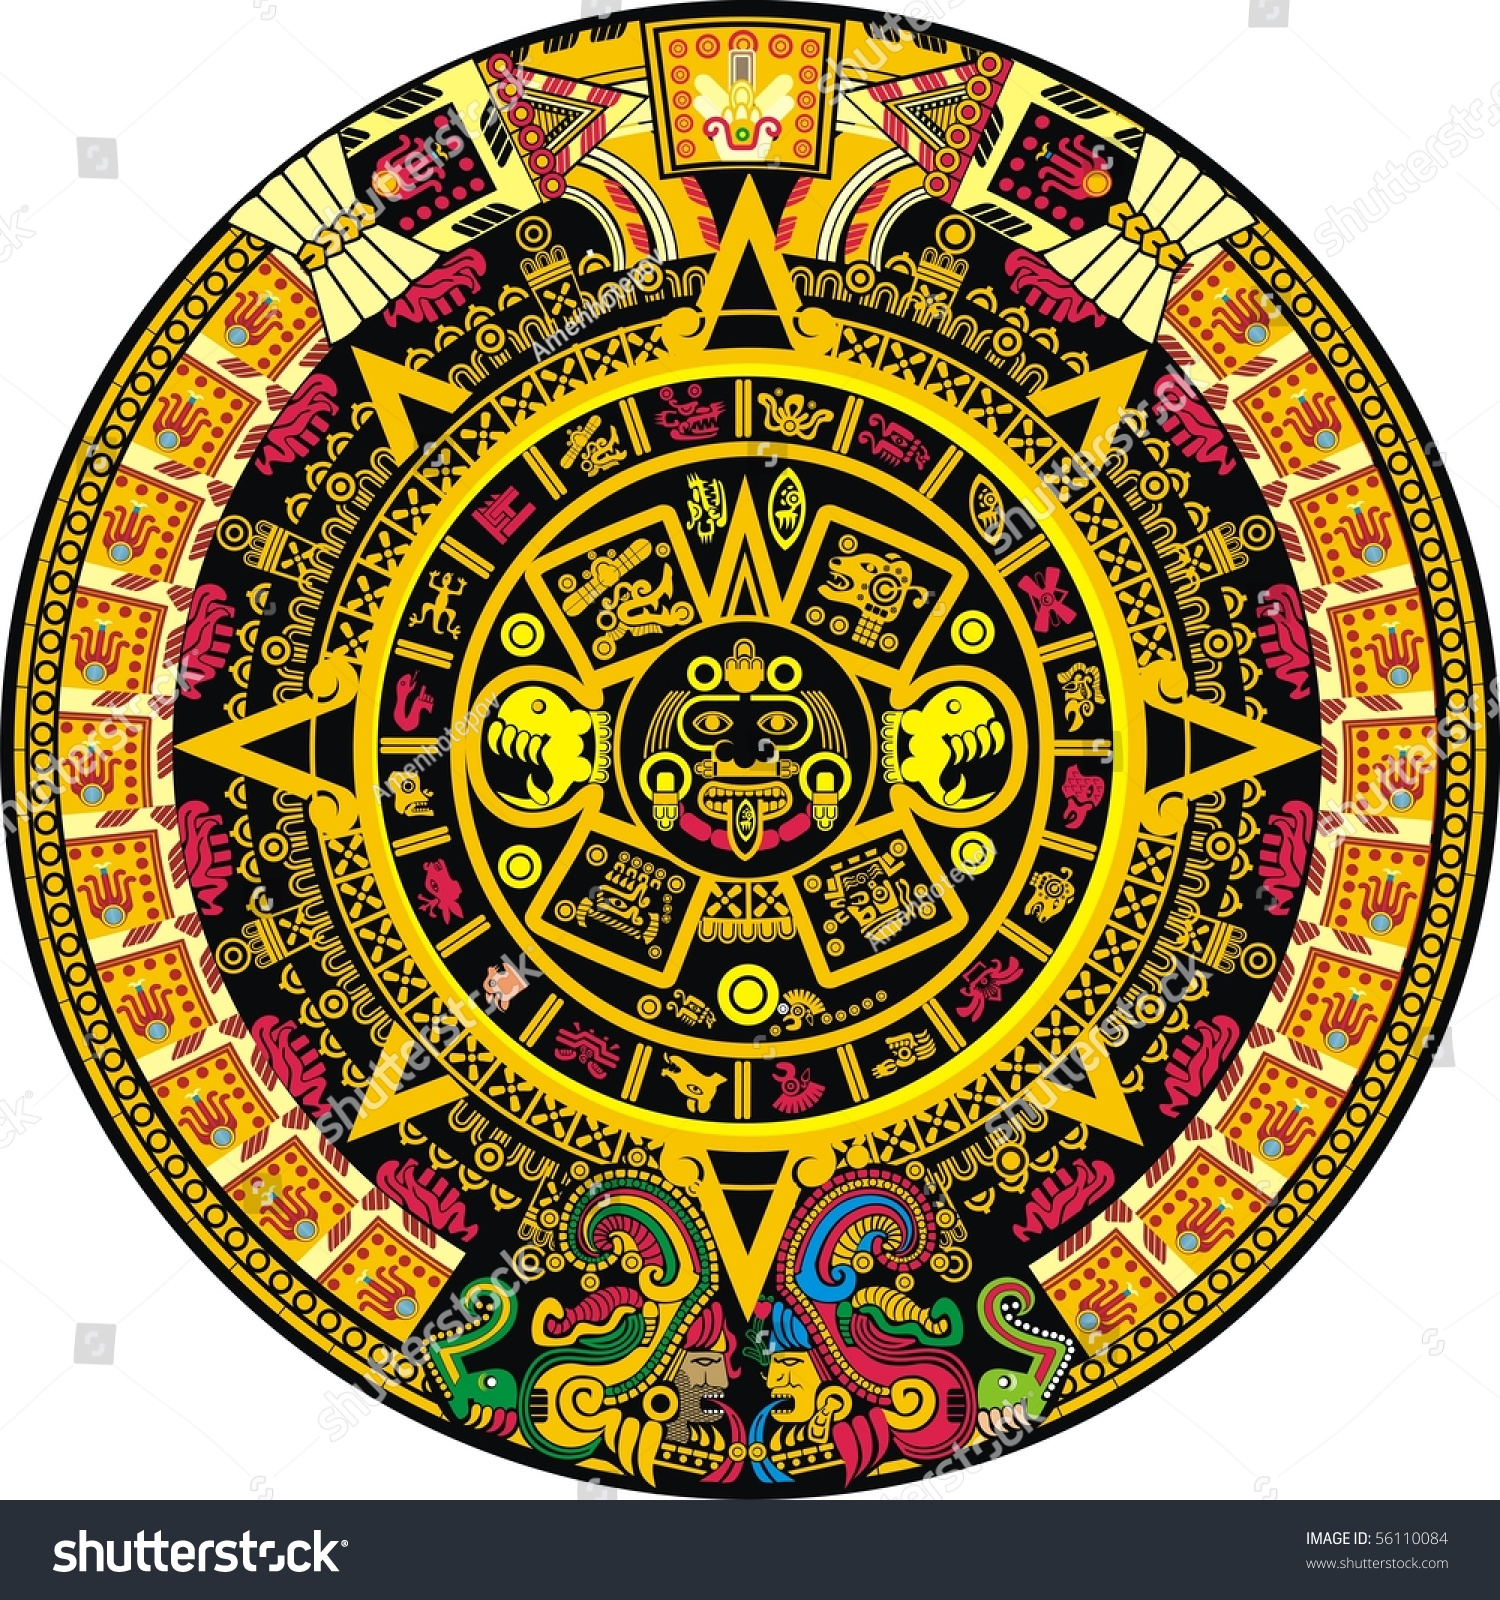 Aztec Calendar Illustration : Aztec calendar color stock vector shutterstock